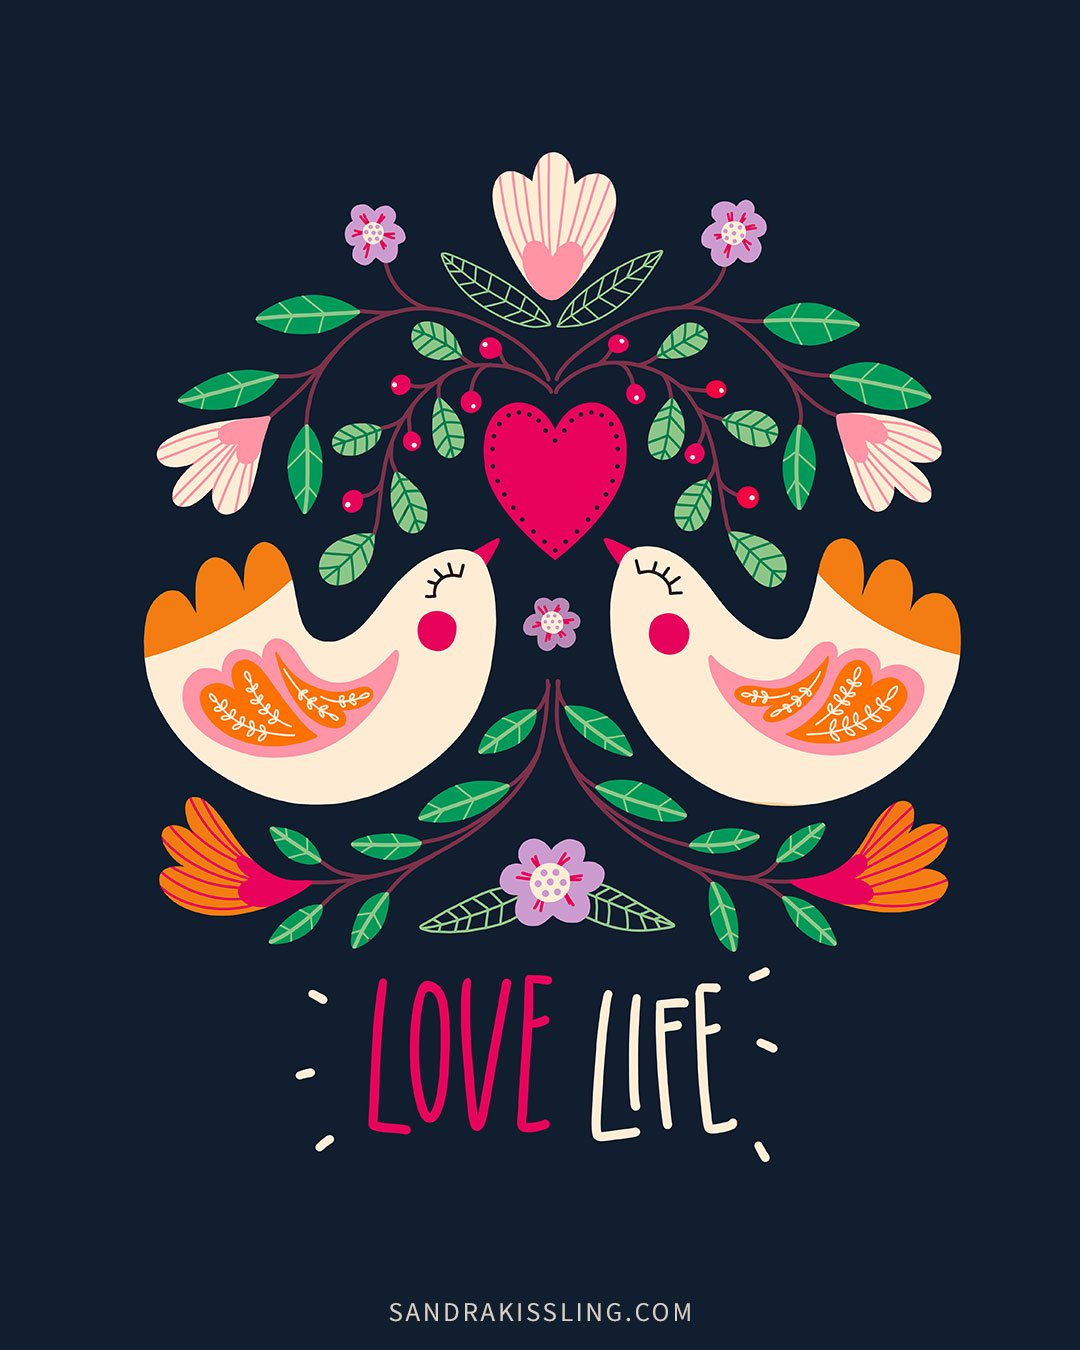 love-life-illustration.jpg